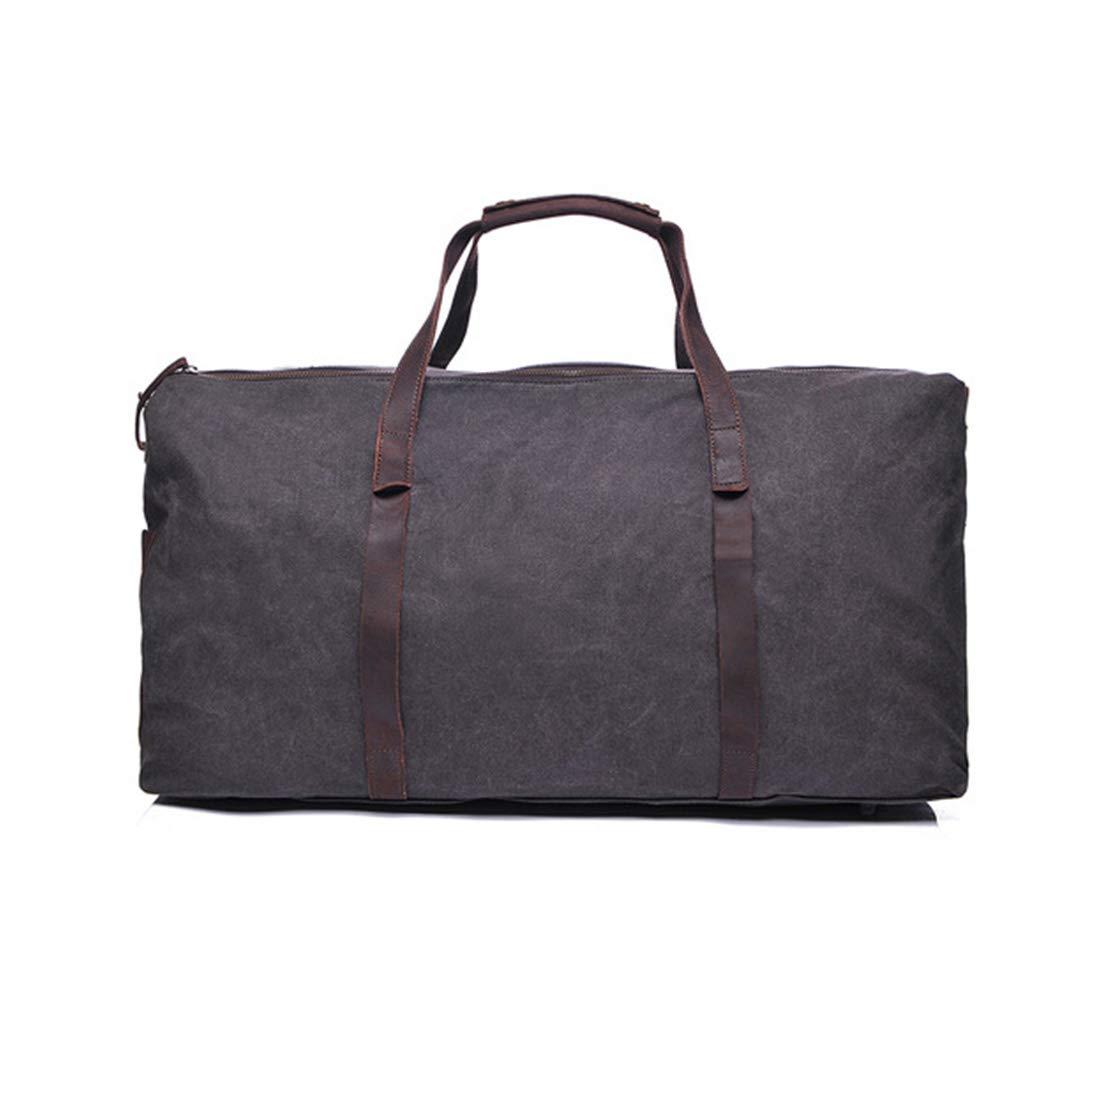 CeSuoLBD キャンバストラベル大容量ハンドバッグシングルショルダークロス多機能荷物袋  ブラック B07RBQWPY3